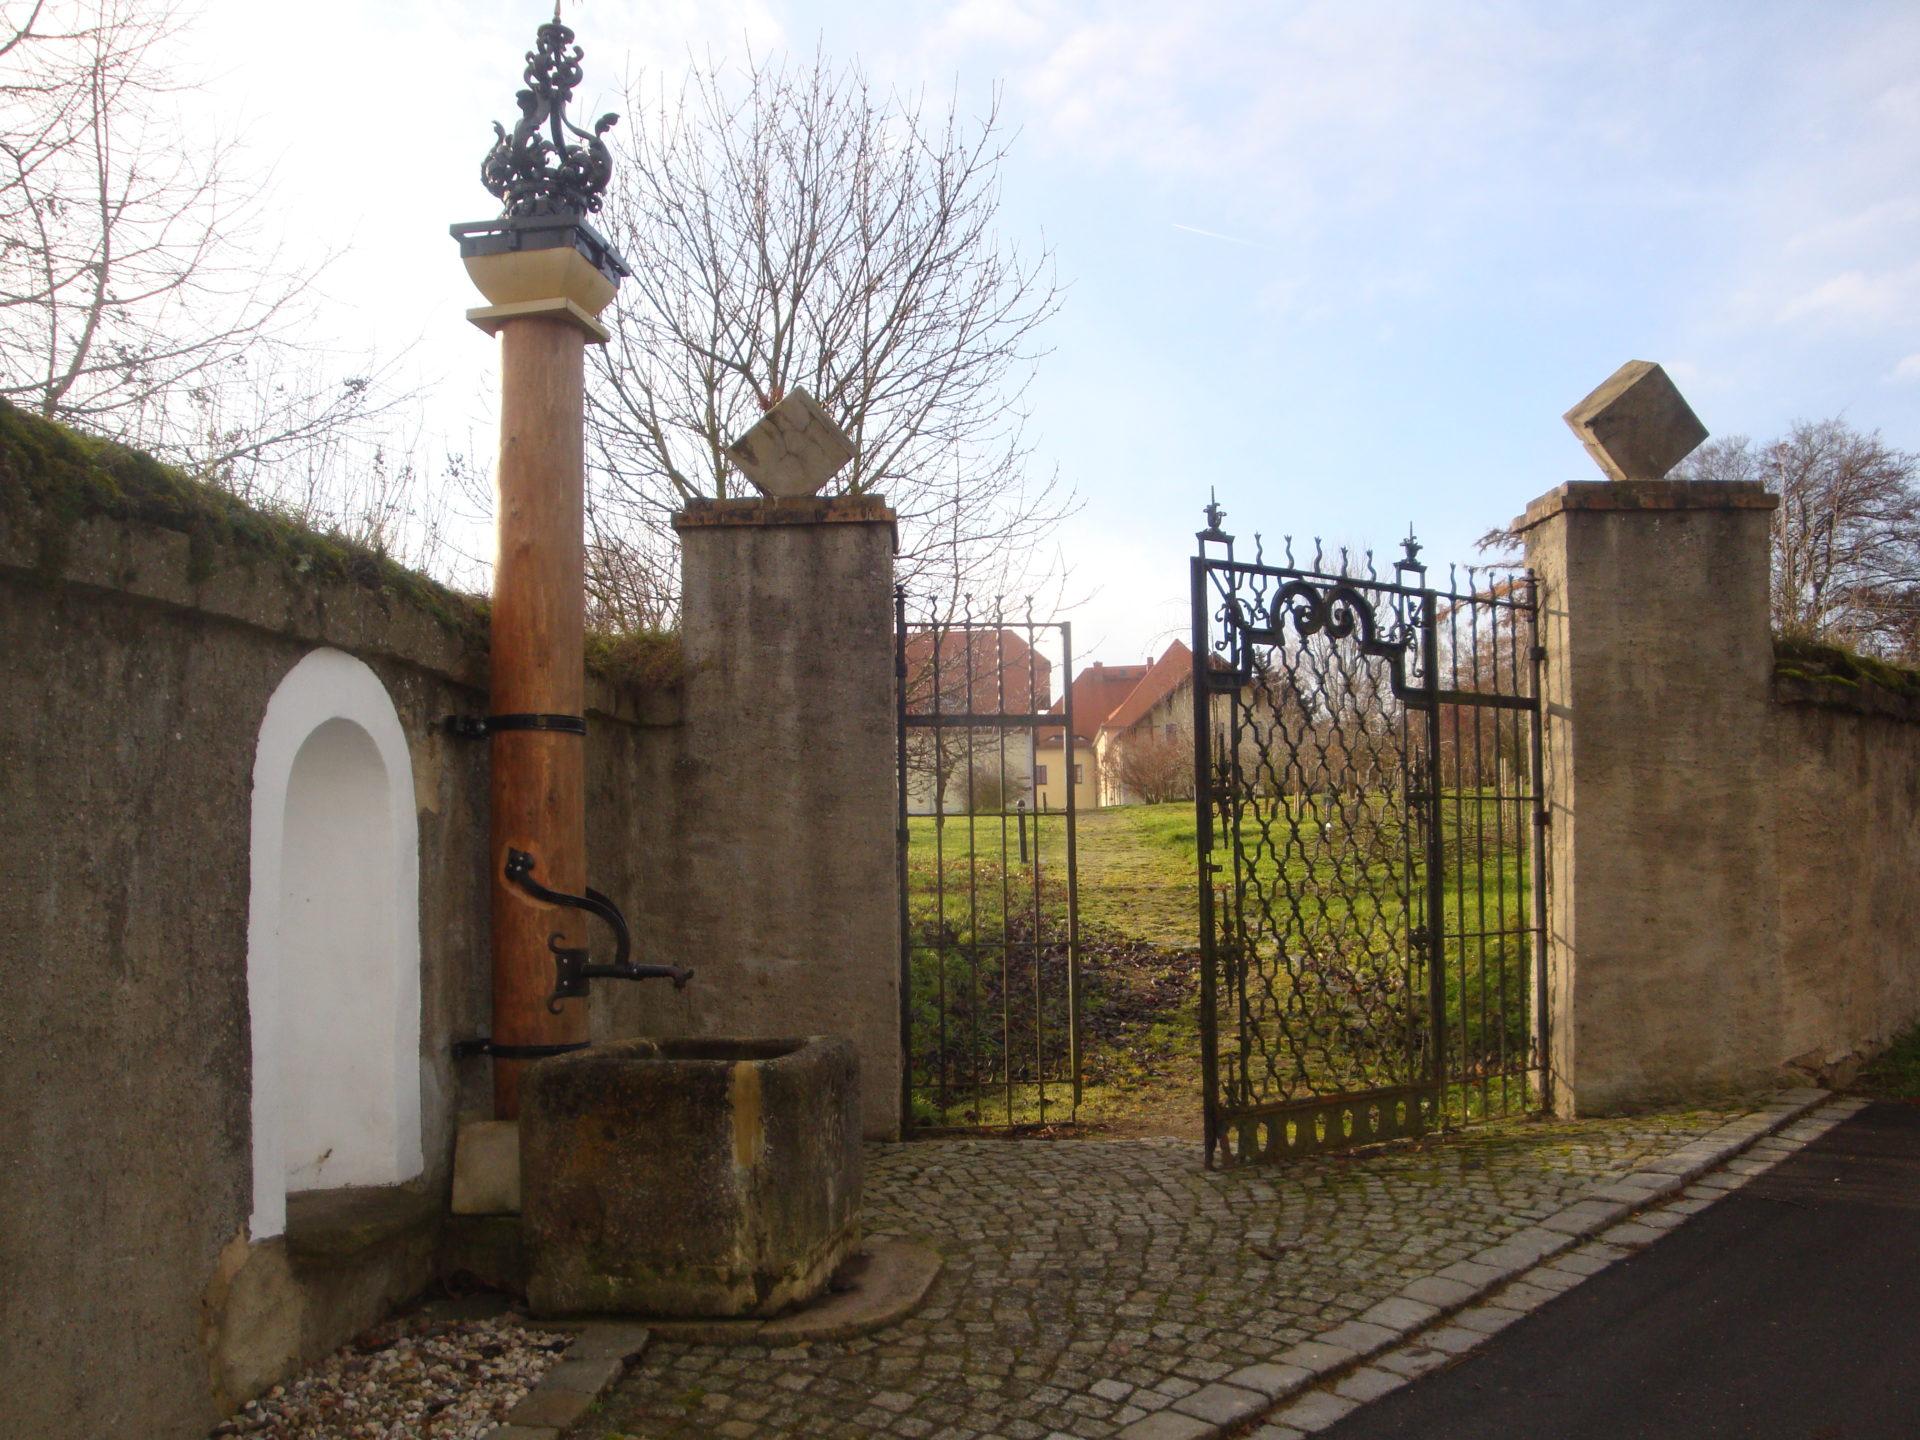 Kloster Marienthal Sornzig, Foto: Rebecca Heinze